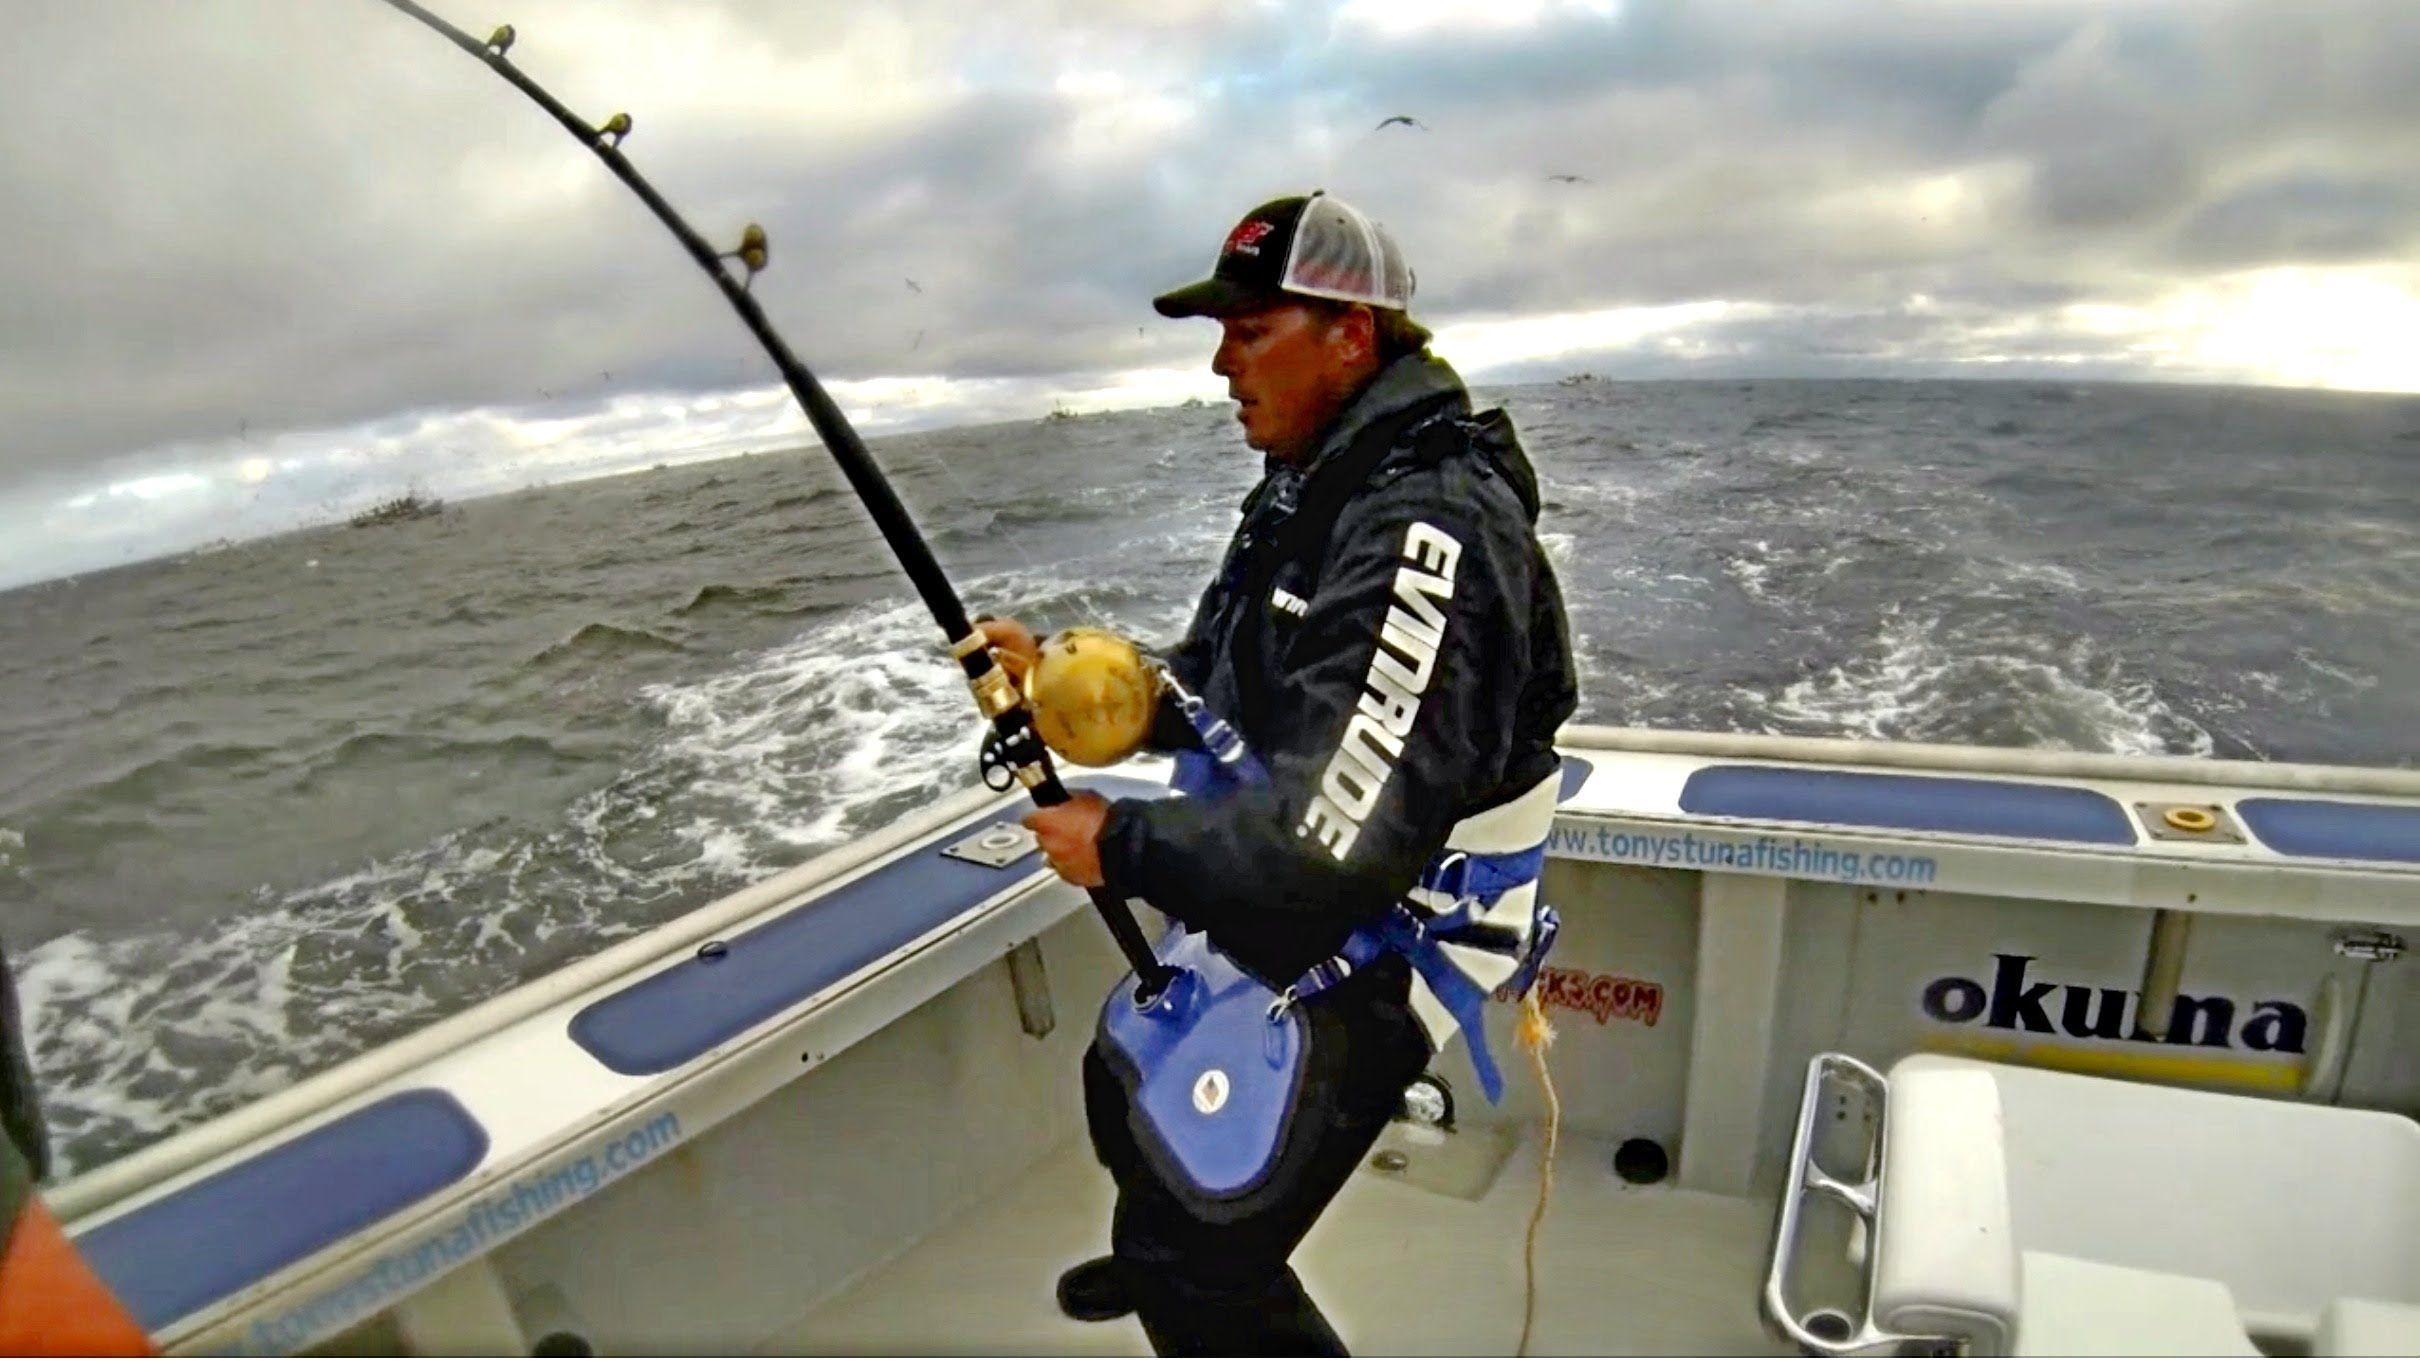 Smc season 10 6 how to catch a 1000 pound bluefin tuna for Tuna fishing pole